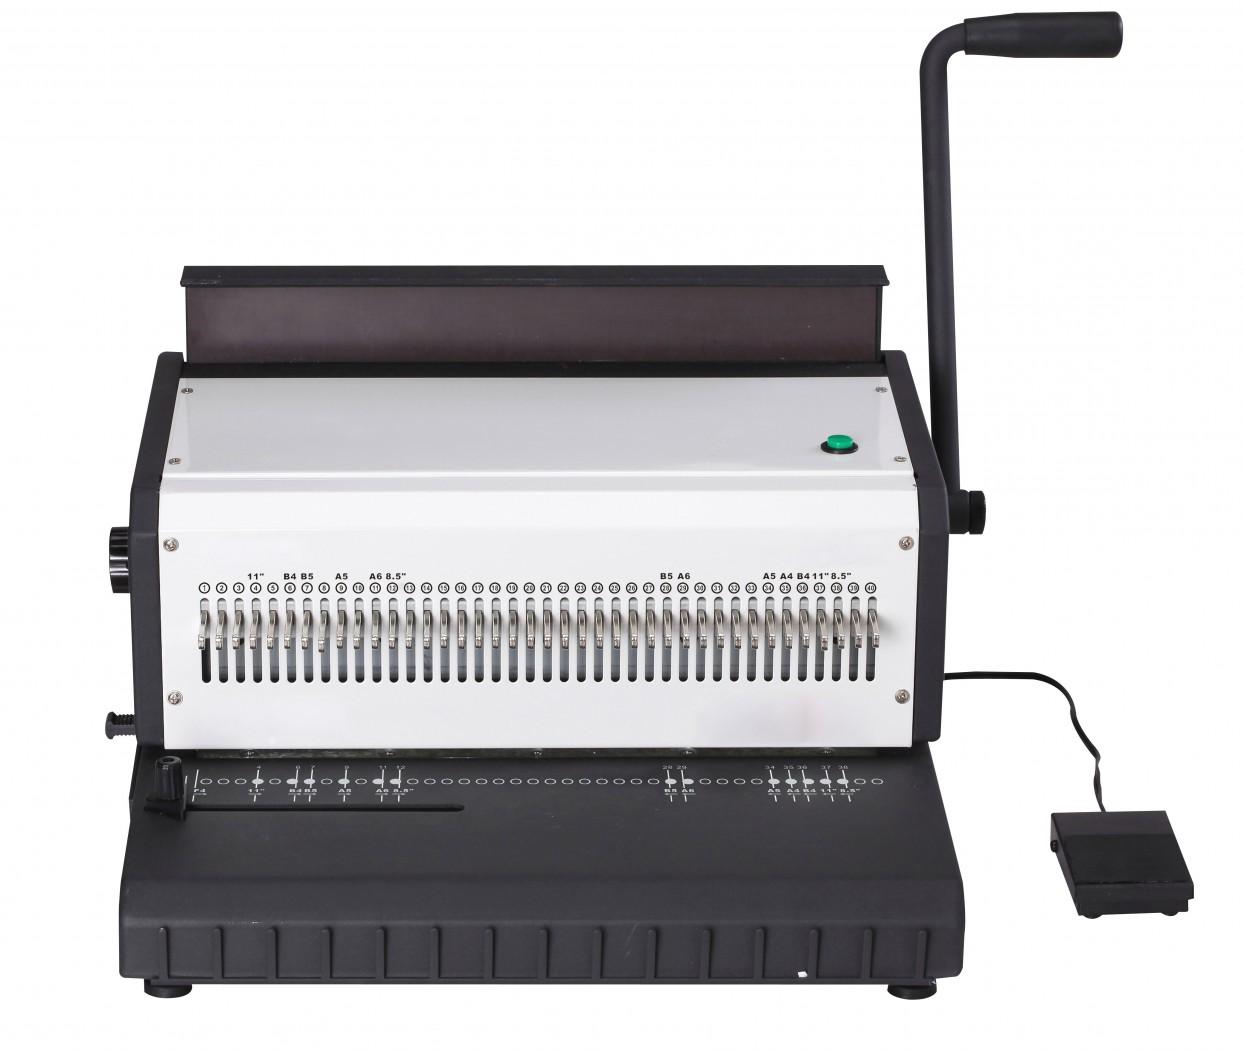 Брошюровщик Office Kit B2112 ручная перфорация 12 листов переплет max 250 листов пластик.пружина (6-28мм) регулир.отступа 1 рукоятка